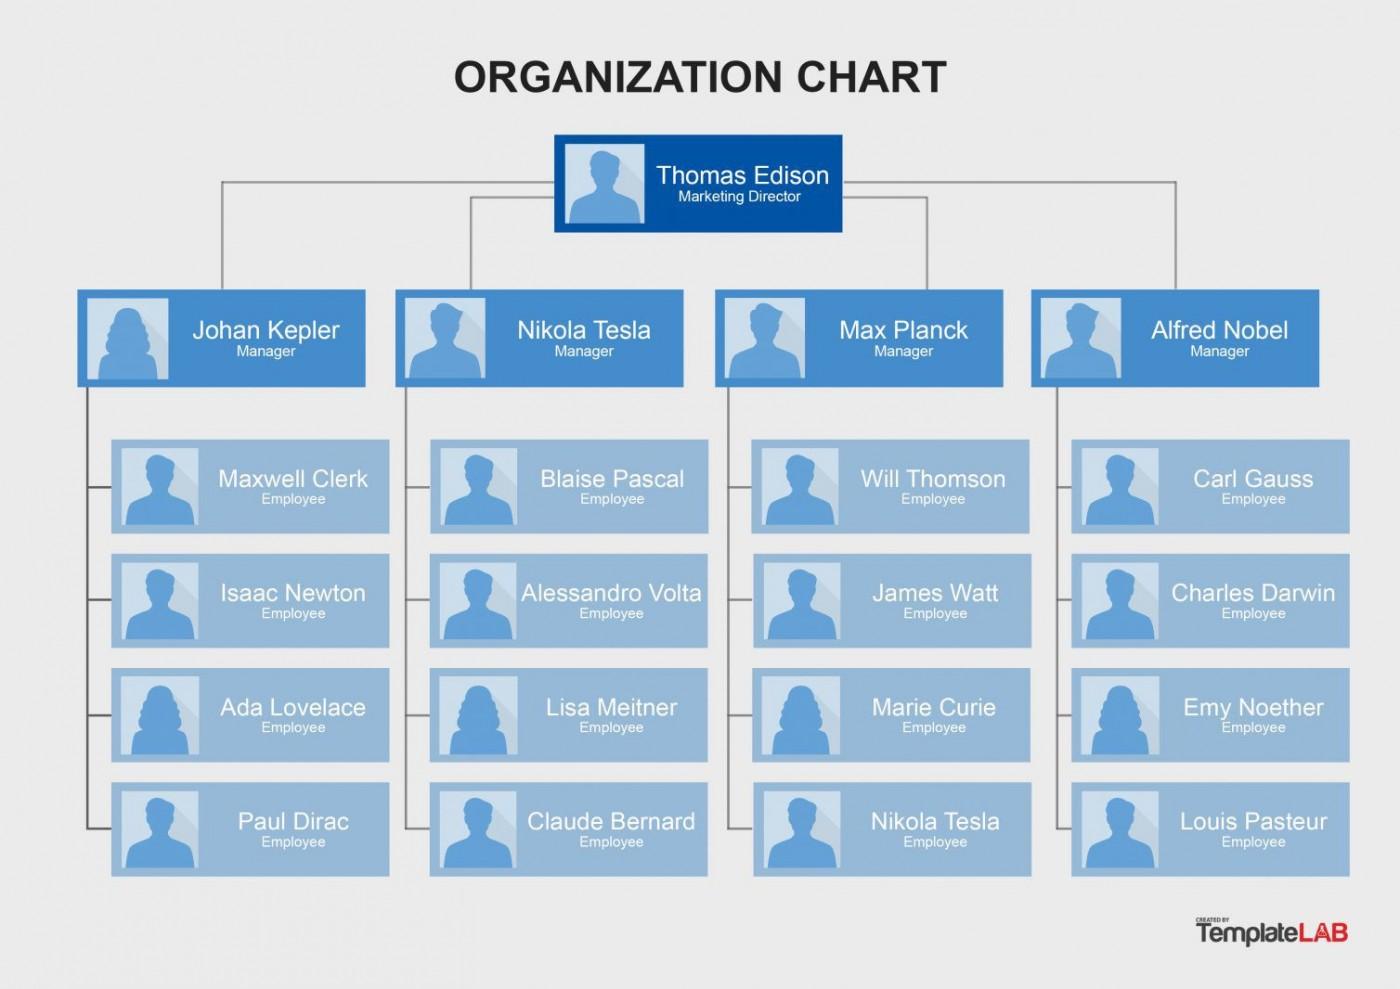 006 Impressive Organizational Chart Template Word Sample  2013 2010 20071400